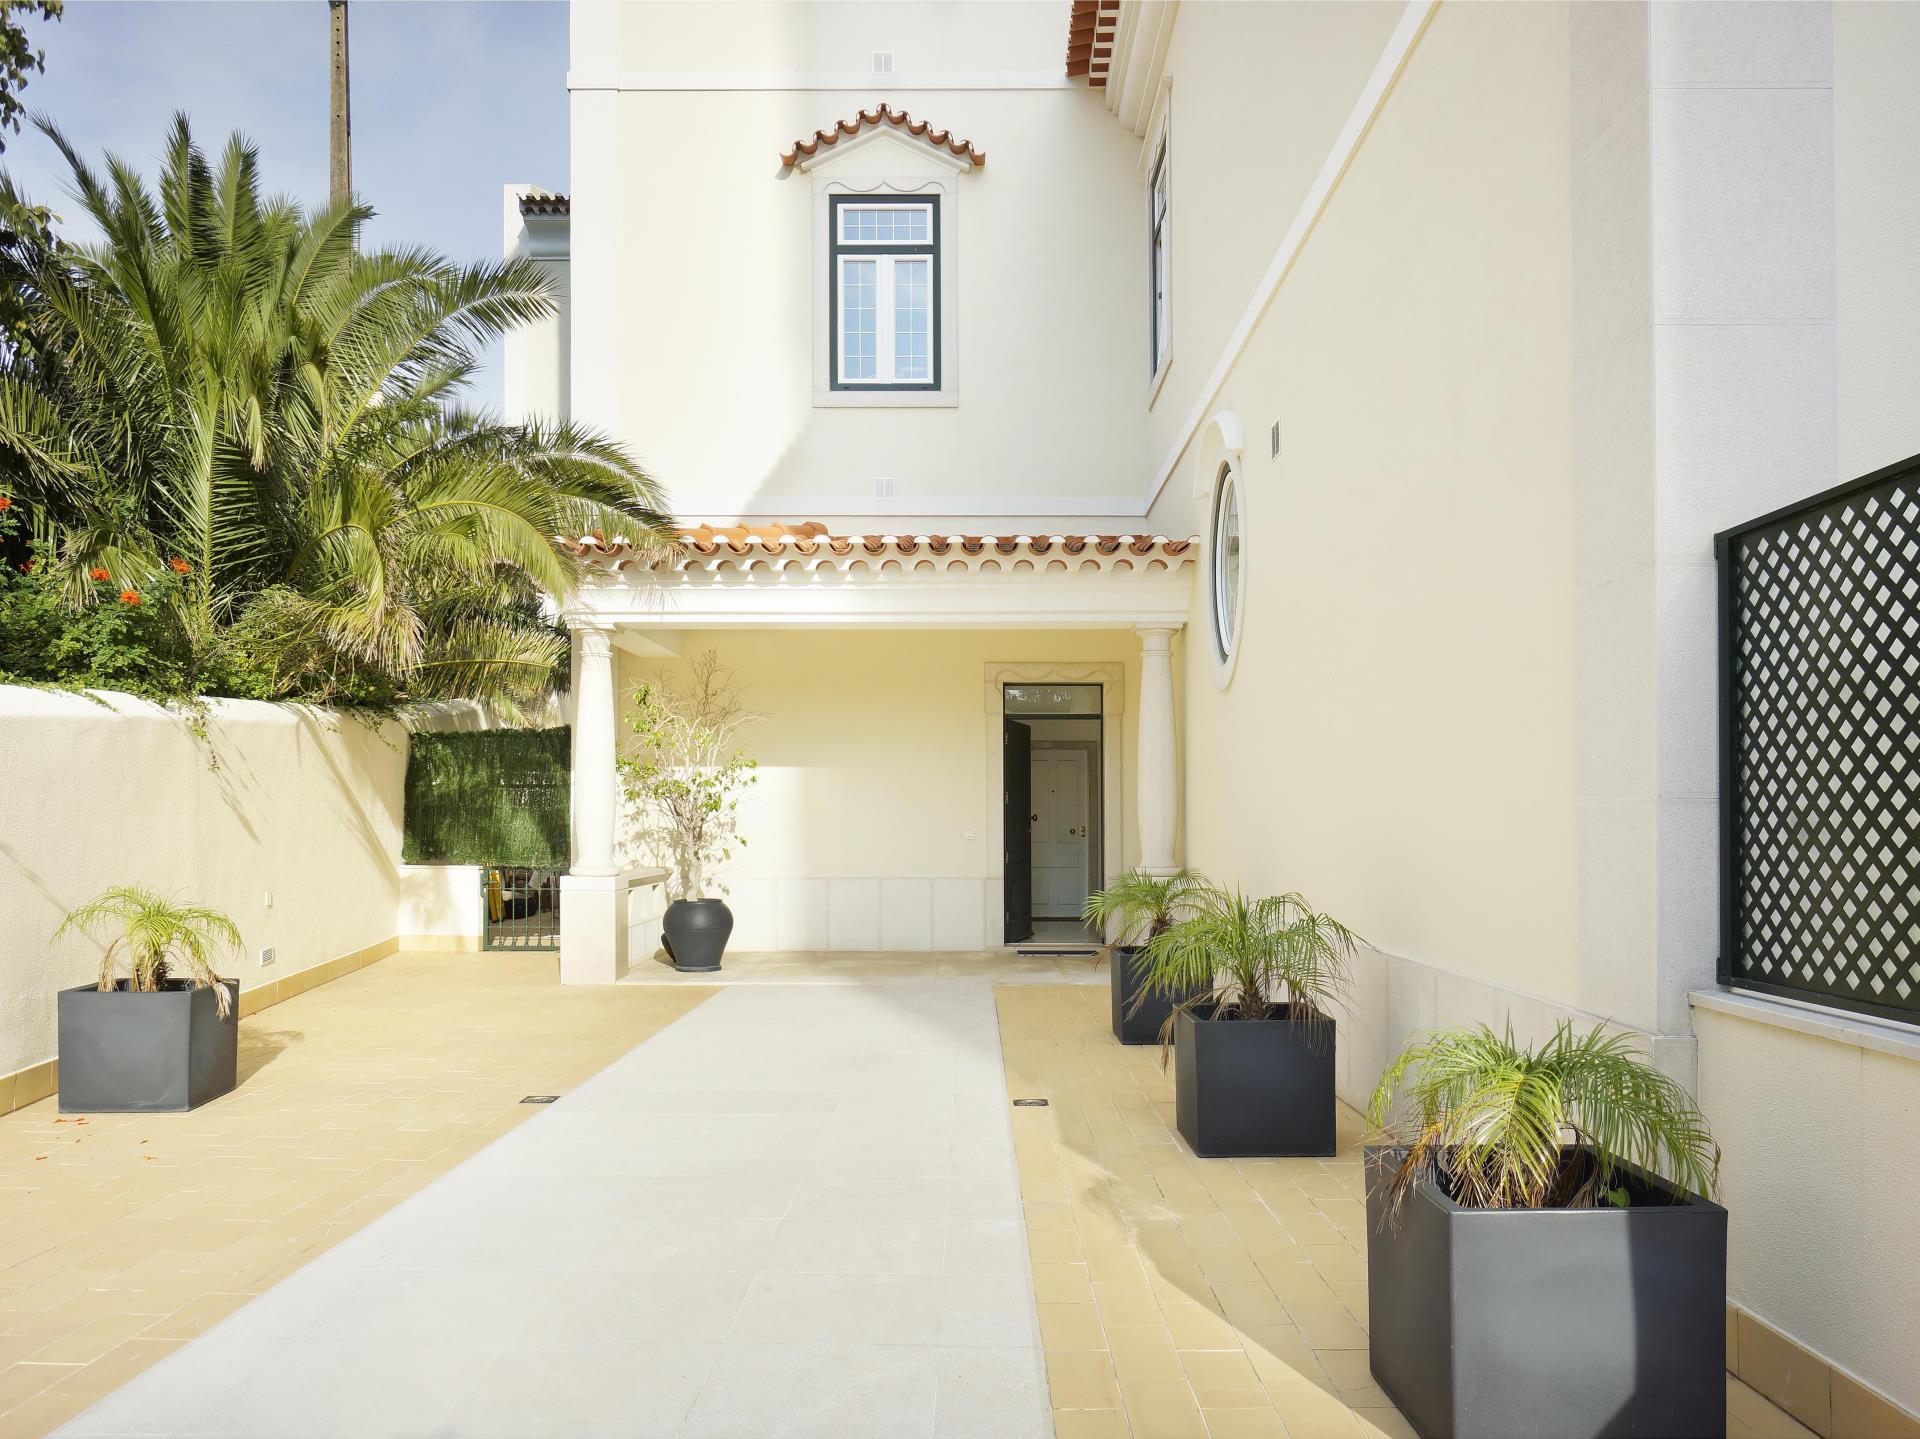 Apartamento por un Venta en Flat, 3 bedrooms, for Sale Monte Estoril, Cascais, Lisboa Portugal